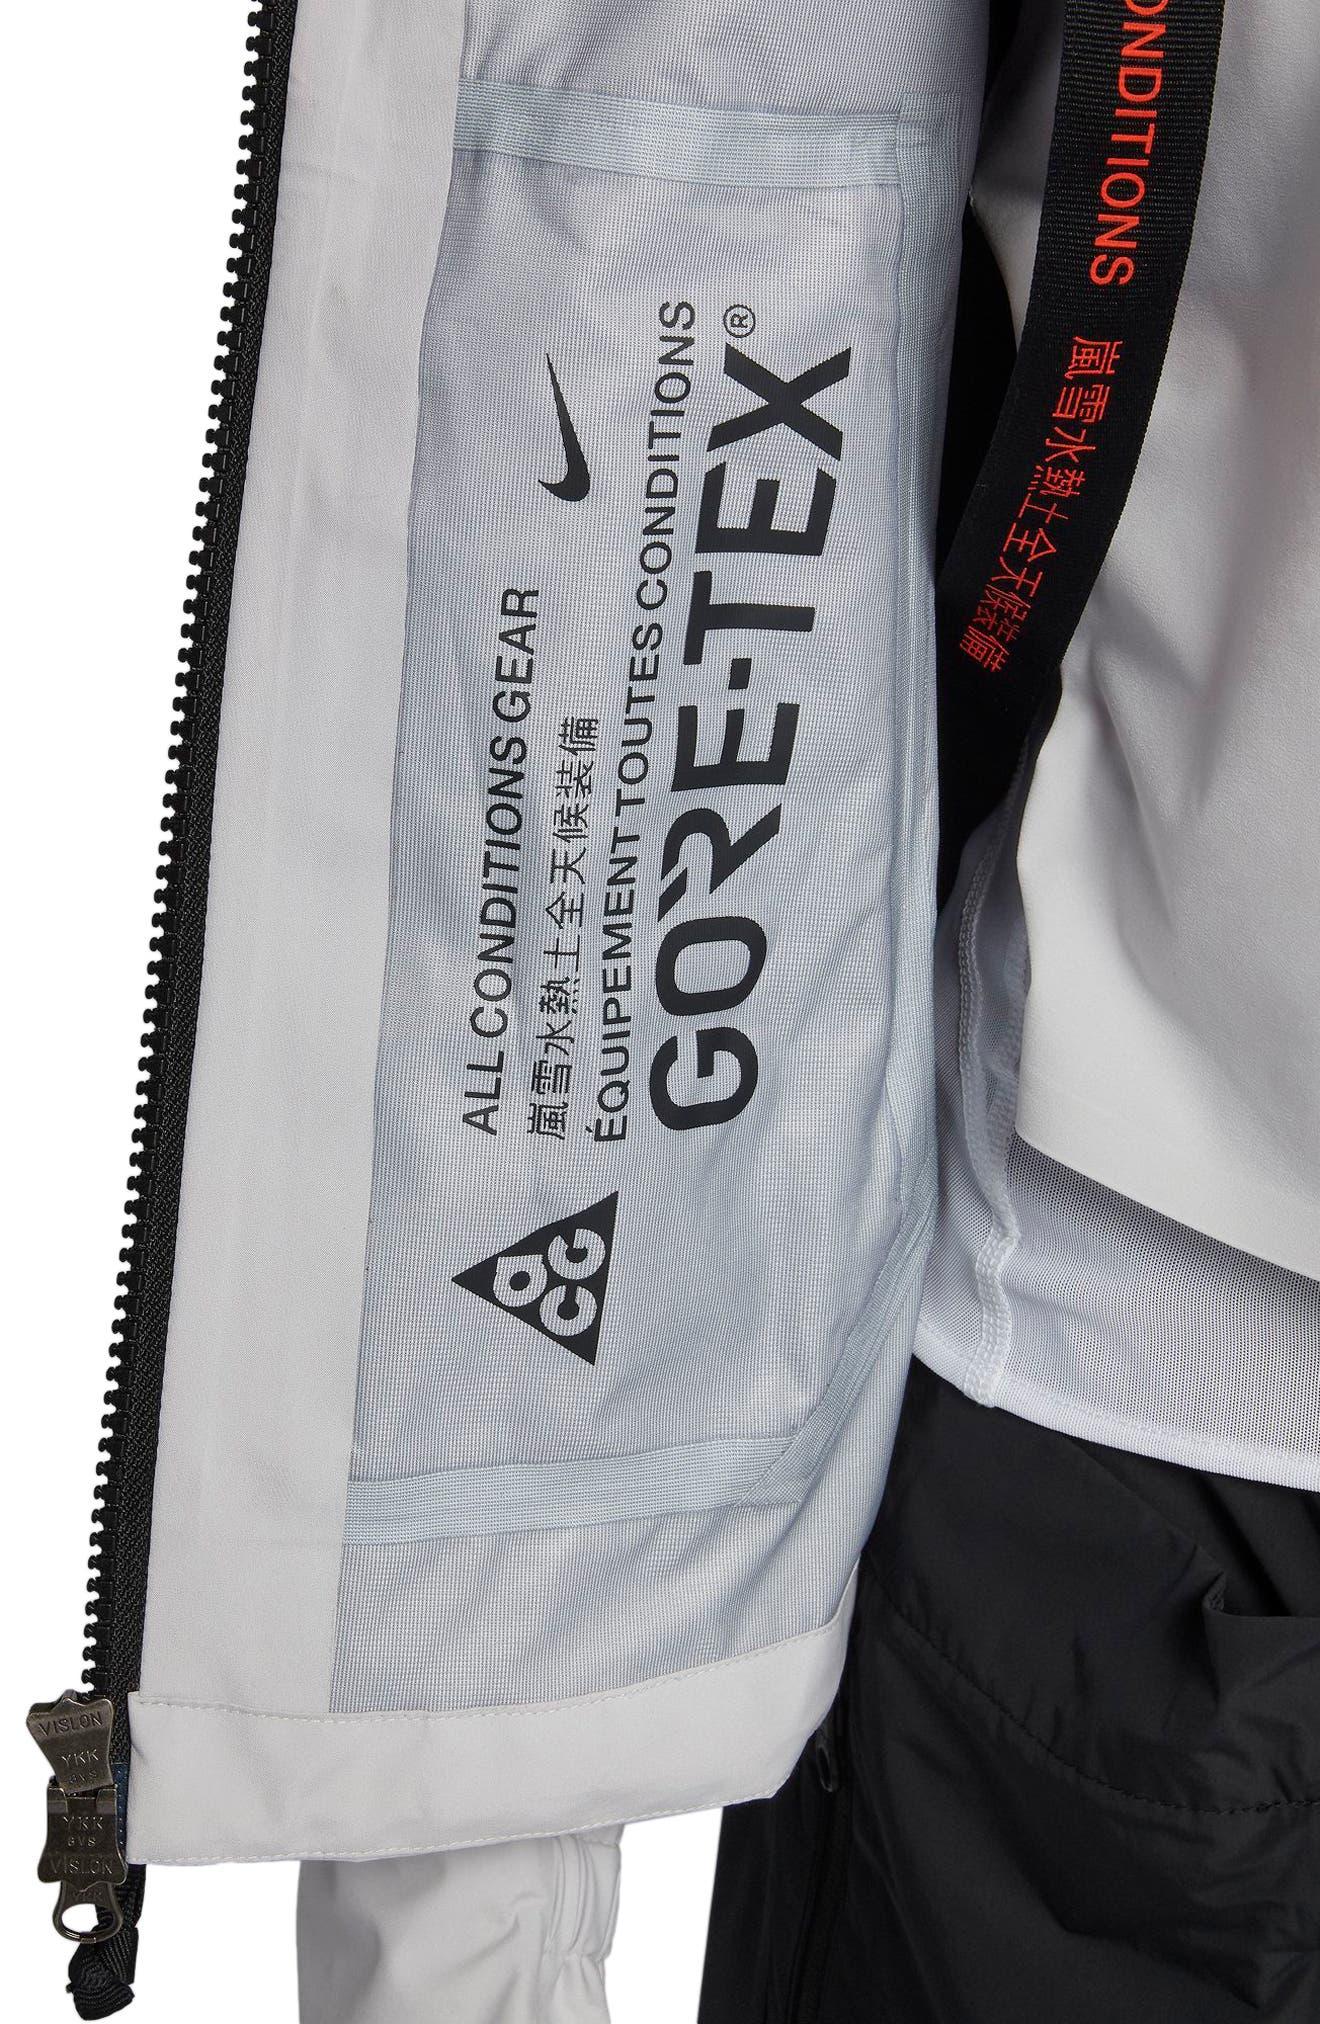 NikeLab ACG Gore-Tex<sup>®</sup> Women's Jacket,                             Alternate thumbnail 14, color,